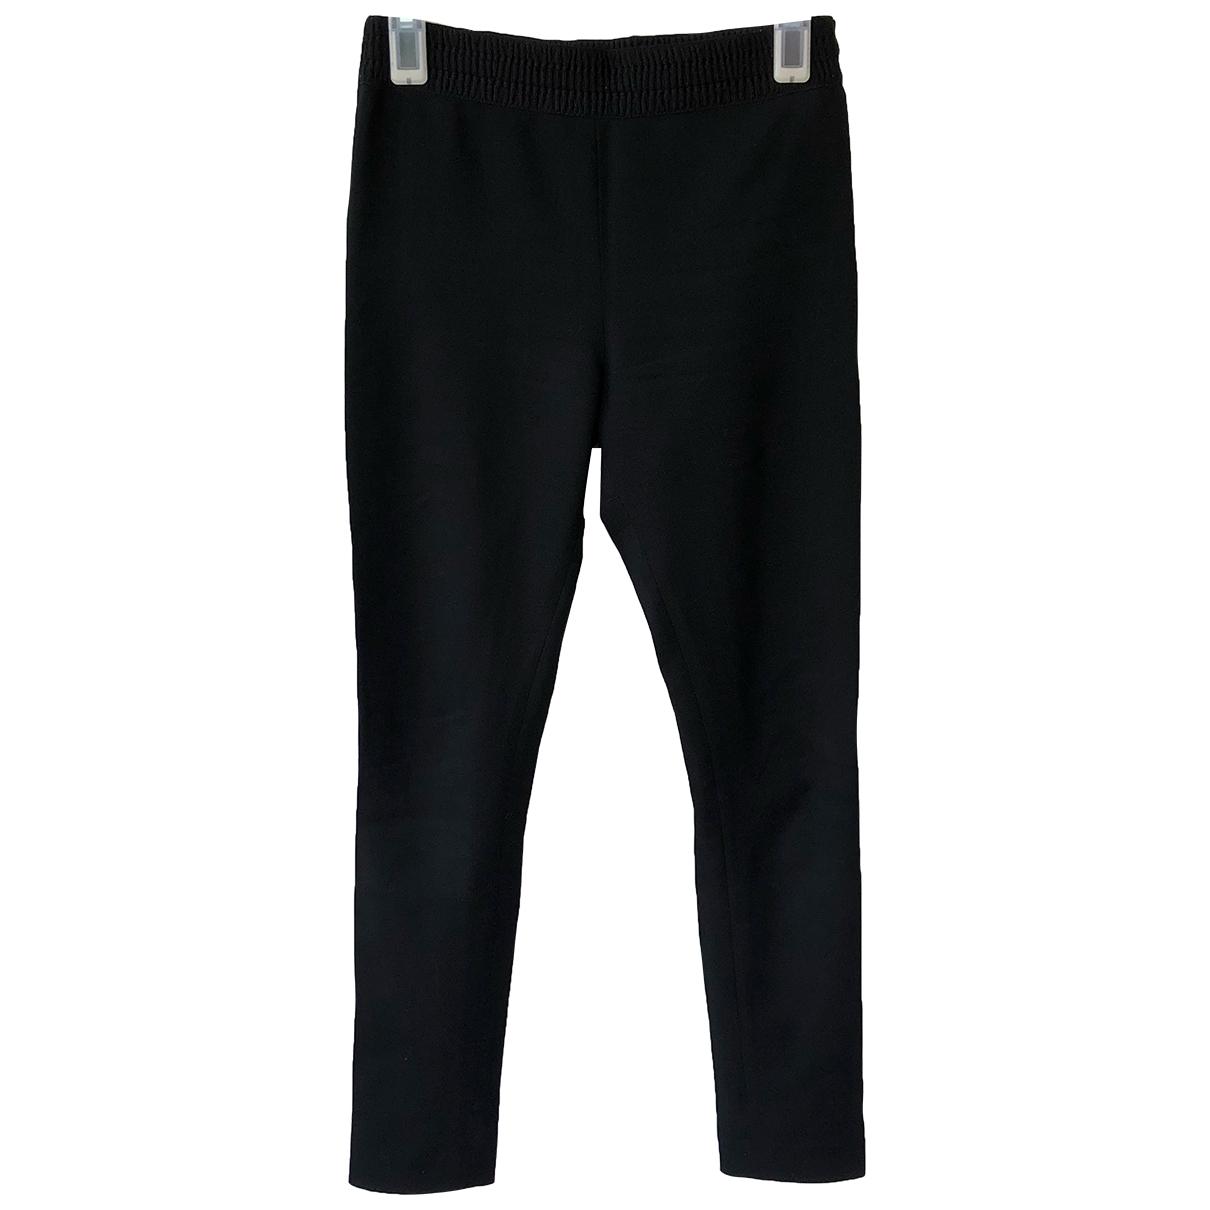 Acne Studios \N Black Wool Trousers for Women 34 FR